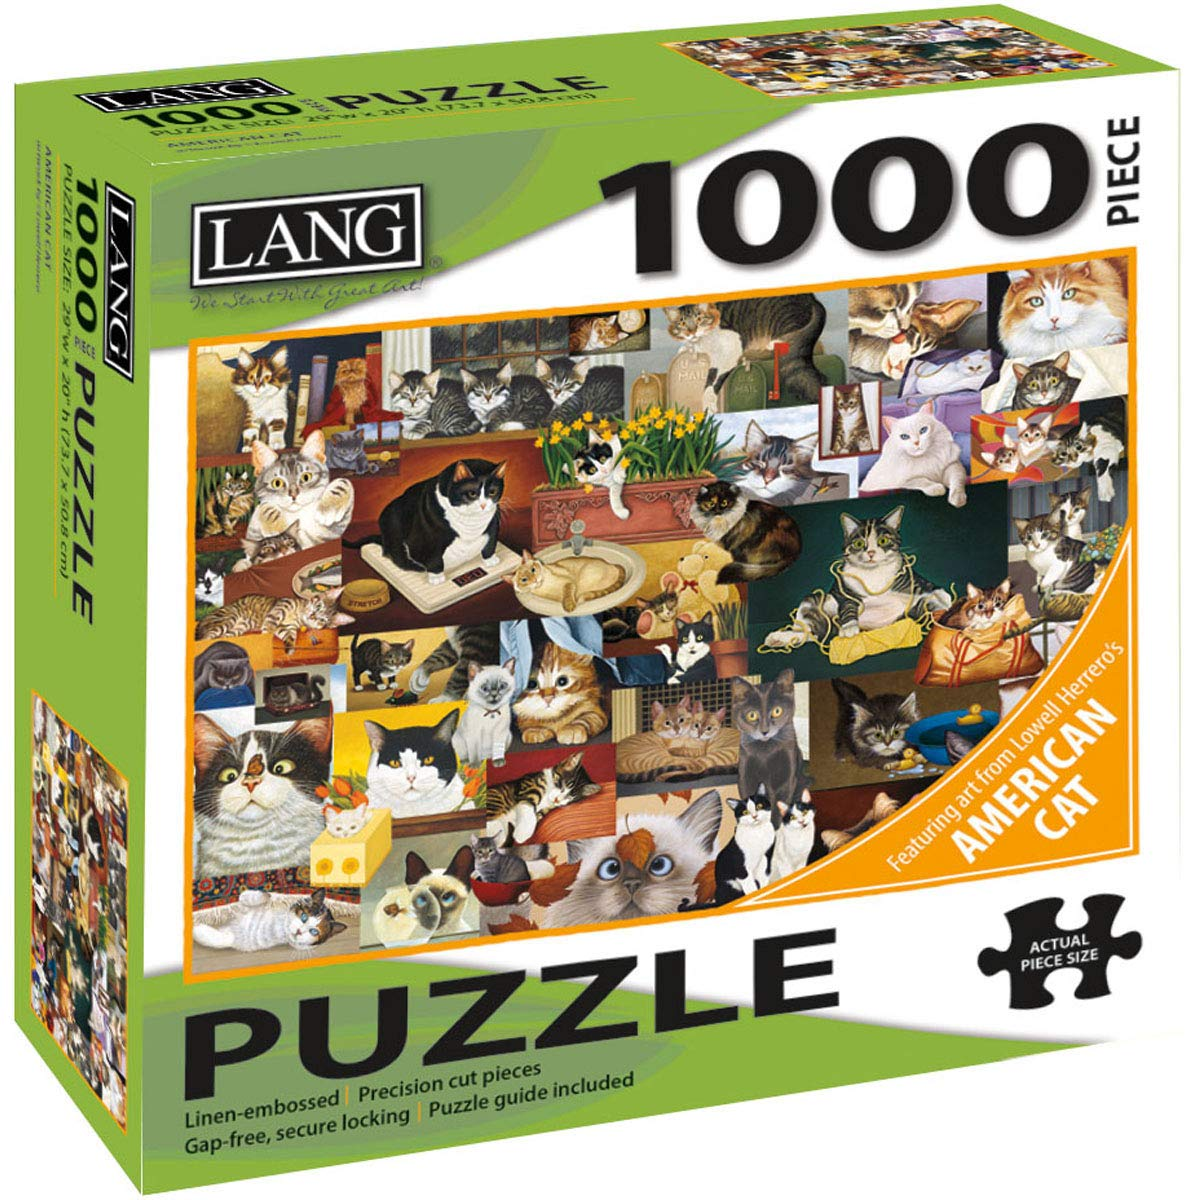 American Cat NOTIB 5038025 LANG Jigsaw Puzzle 1000 Pieces